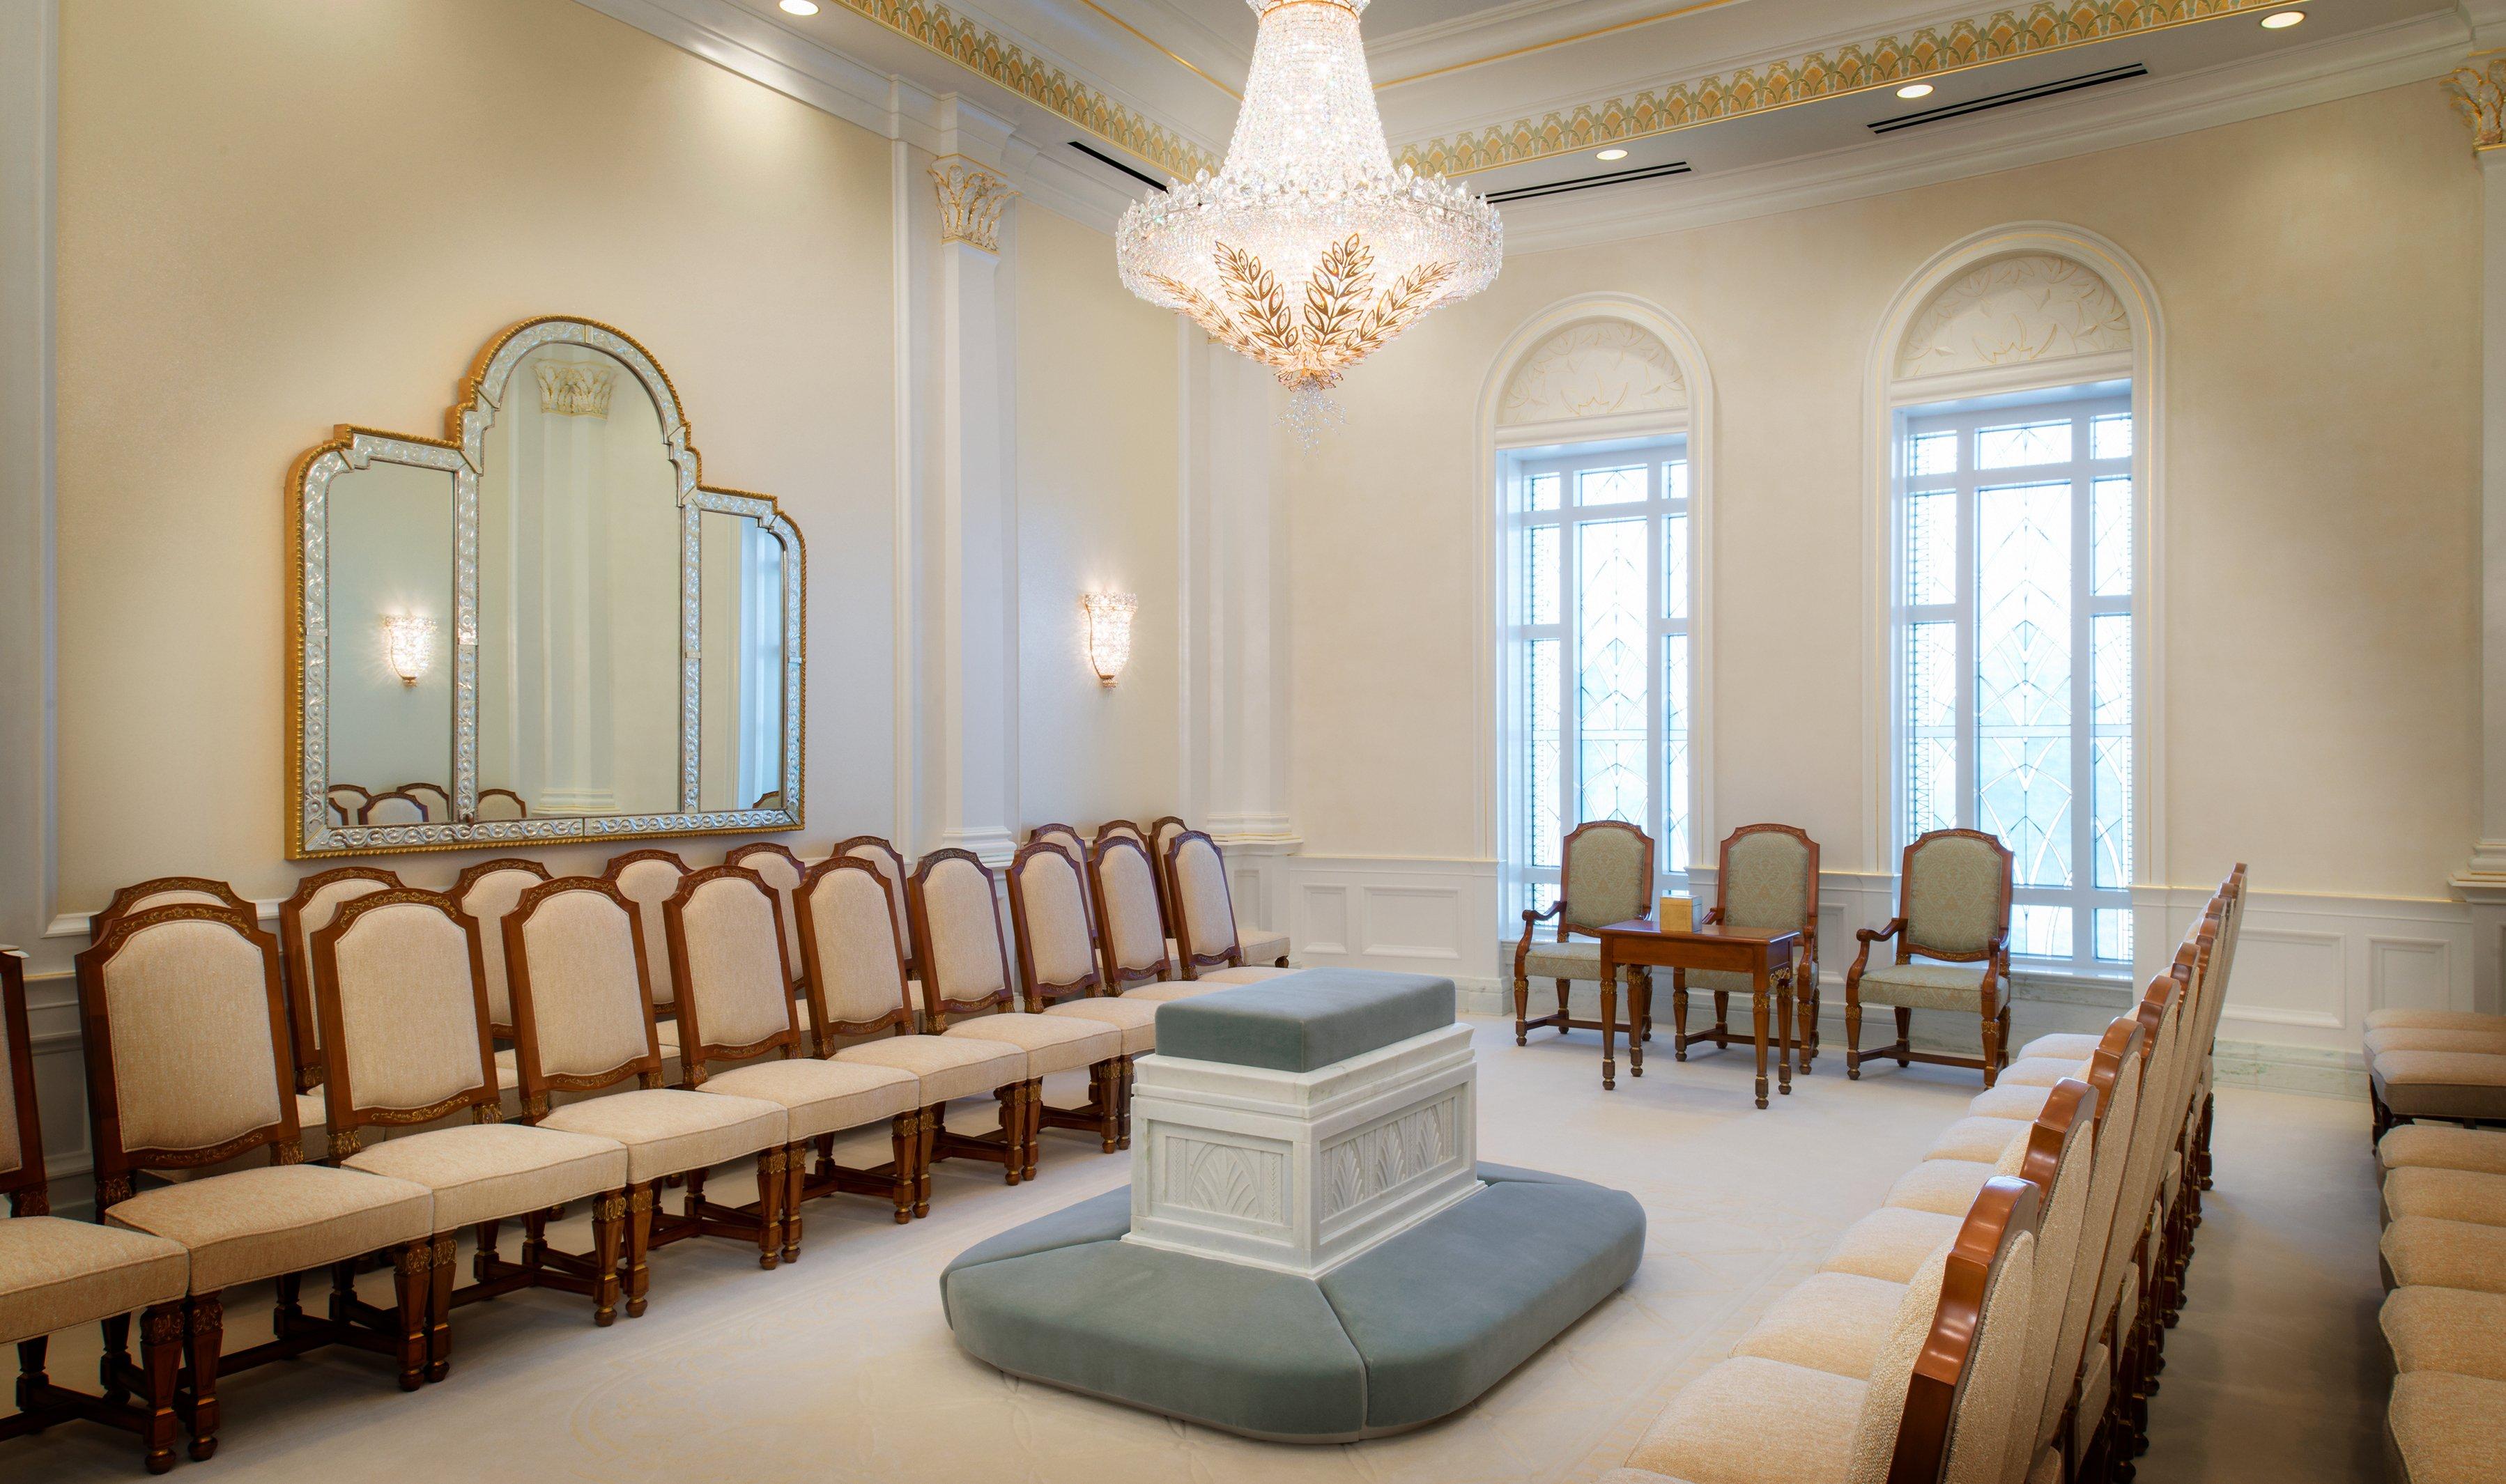 Ft_Lauderdale_Temple_Sealing_room